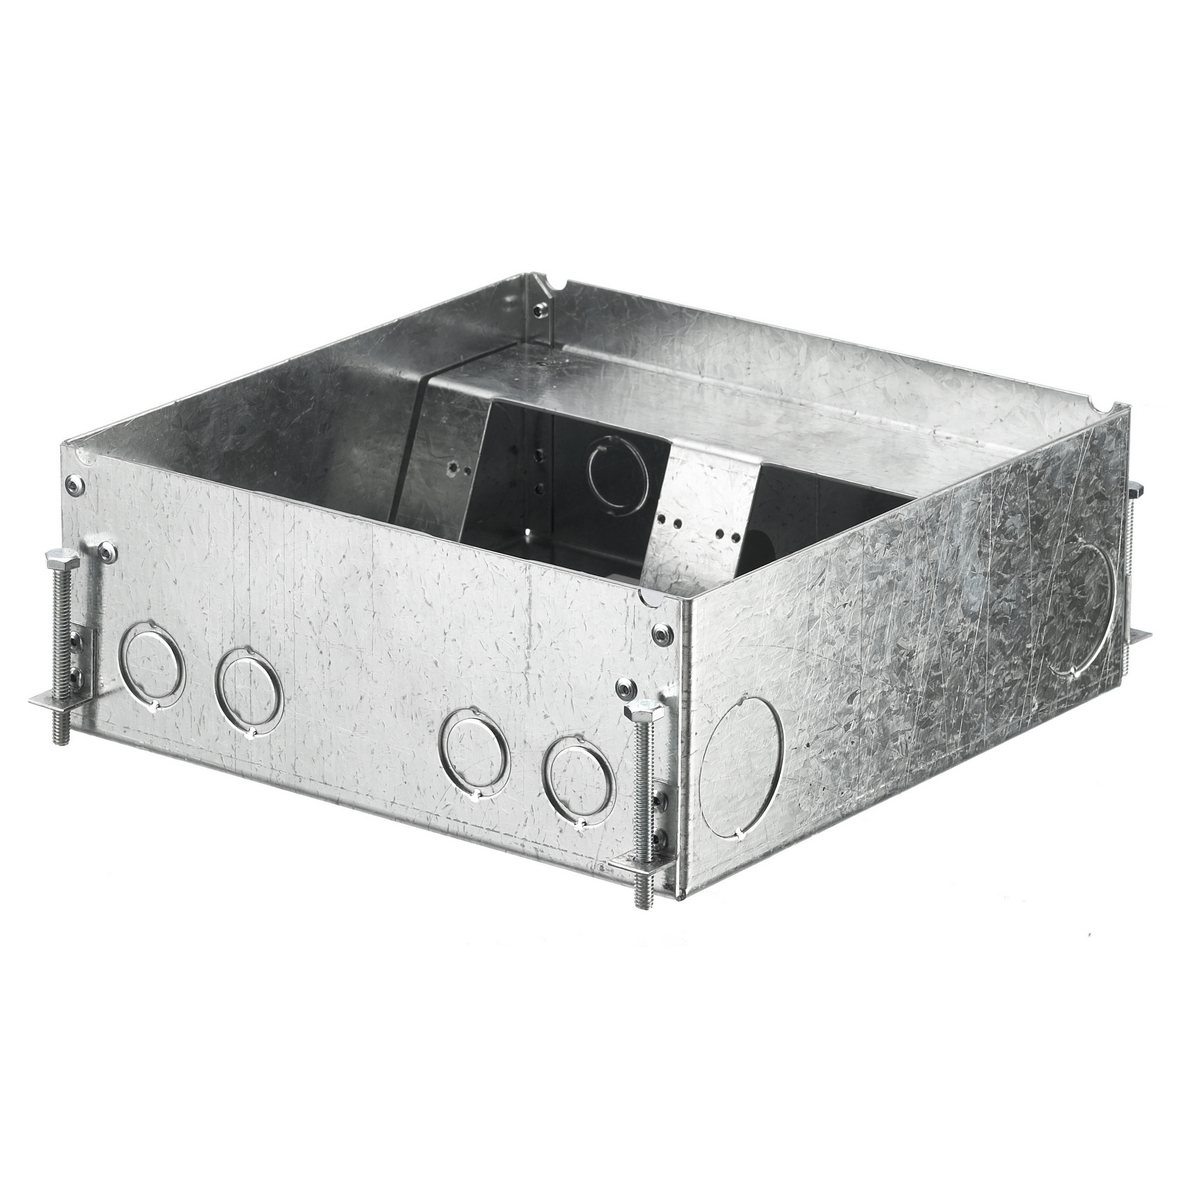 F-BOX, CONCRETE, 4 GANG DEEP